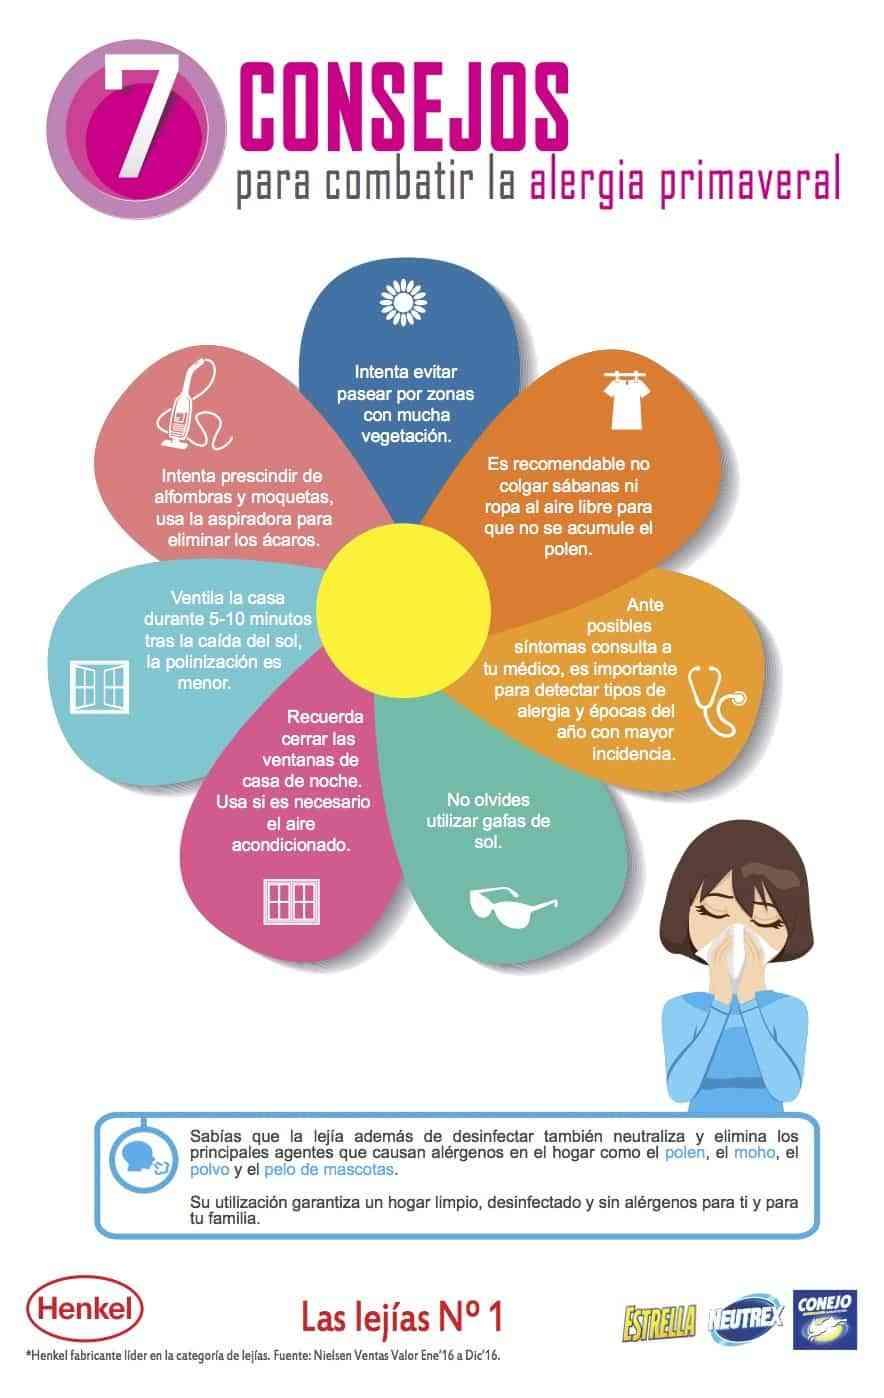 Infografia Consejos para combatir la alergia primaveral